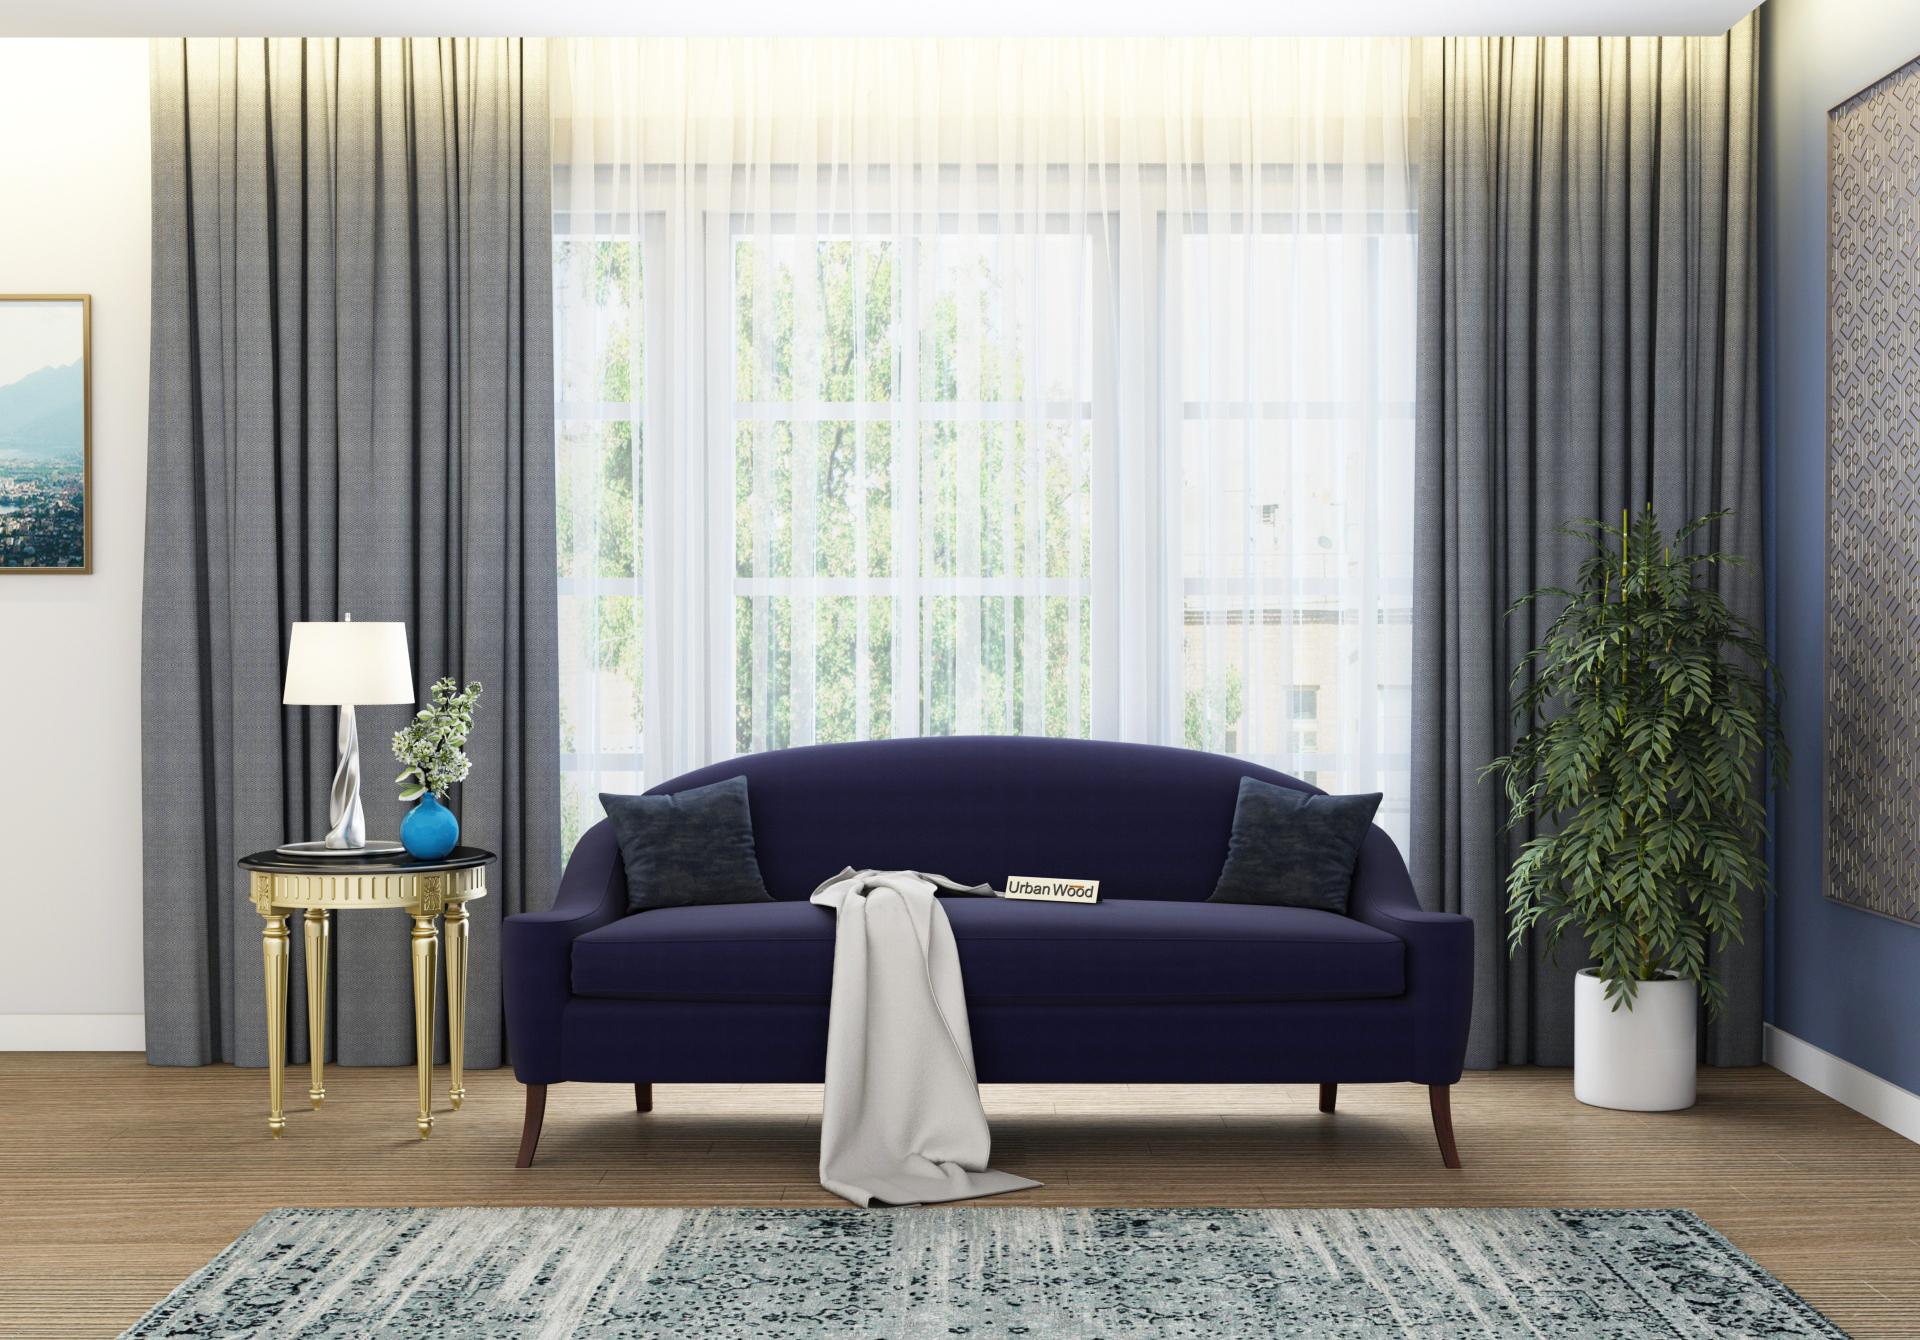 Crimson 3 Seater Sofa <small>(Cotton, Navy blue)</small>